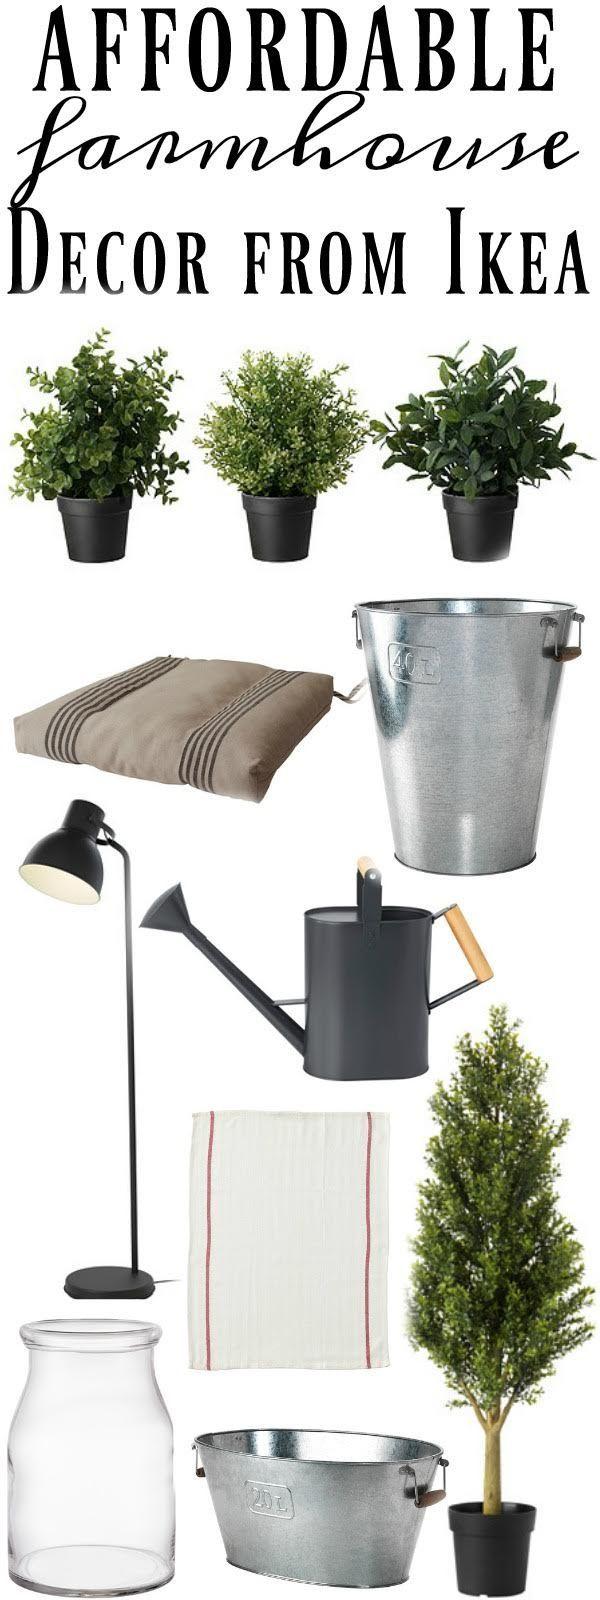 25 best ideas about ikea farmhouse sink on pinterest farm sink kitchen butcher block. Black Bedroom Furniture Sets. Home Design Ideas